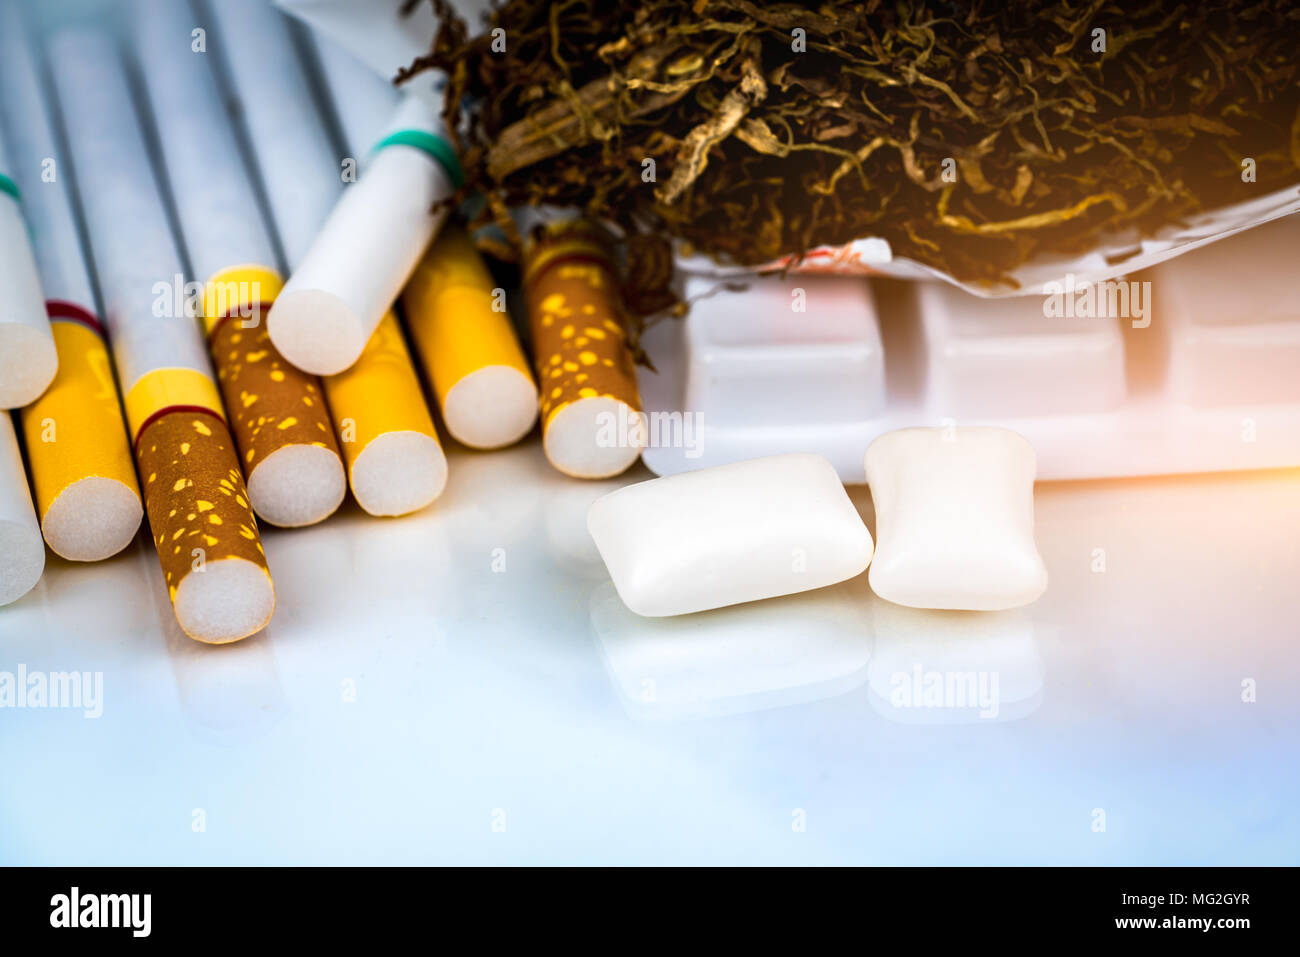 Smoking To Lung Cancer Stock Photos & Smoking To Lung Cancer Stock